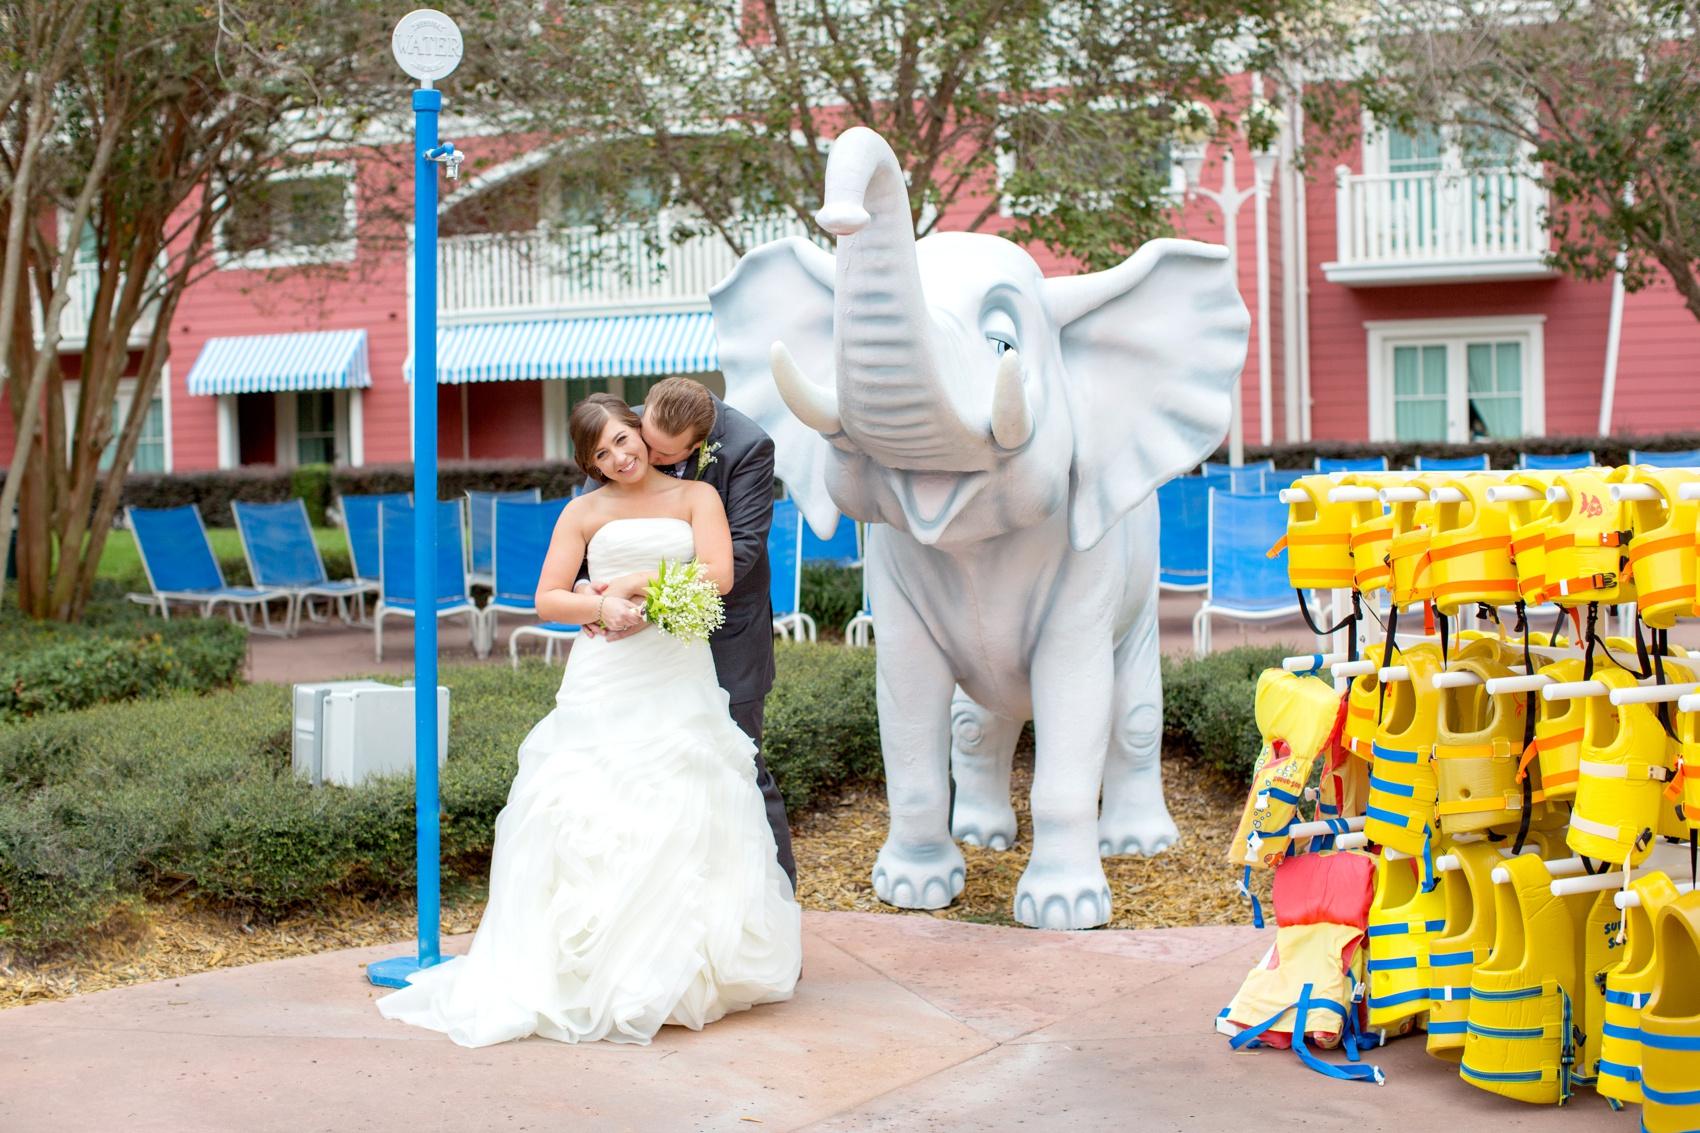 Disney World Wedding Photos By Mikkel Paige Photography At Board Walk Hotel